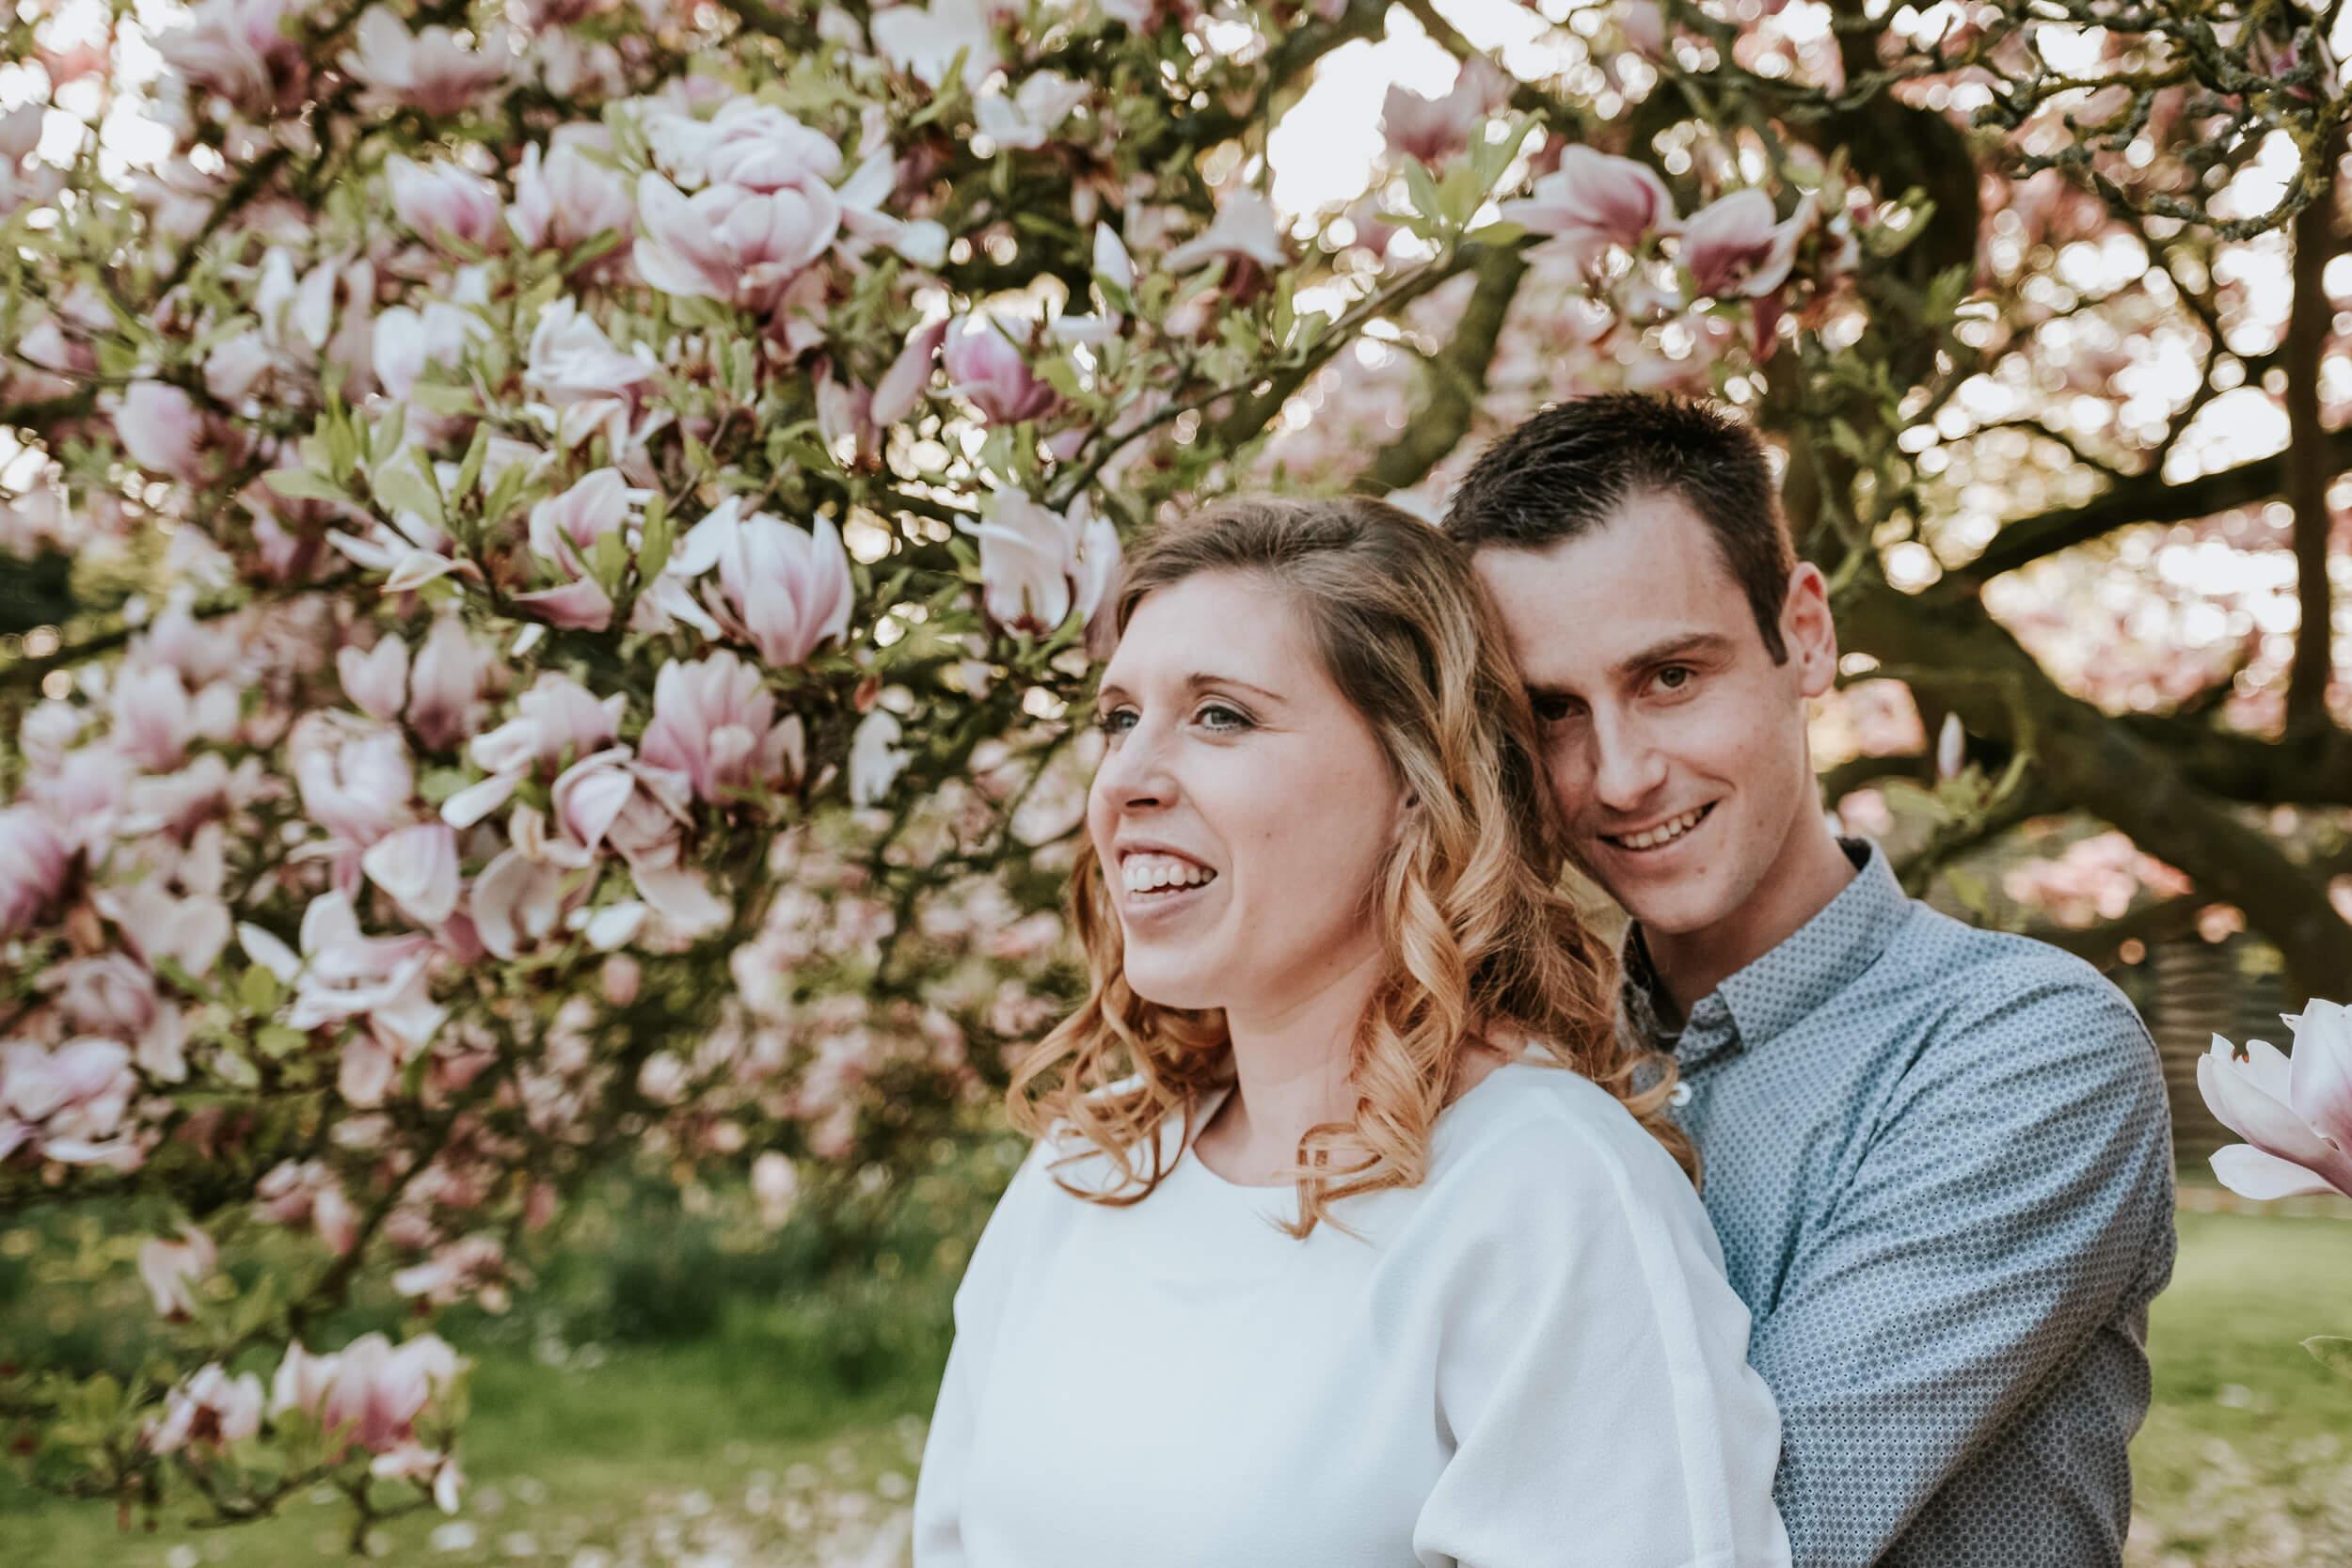 Verloving-Engagement-Vlooybergtoren-Hoegaarden-Tielt-Alternatief-14.JPG